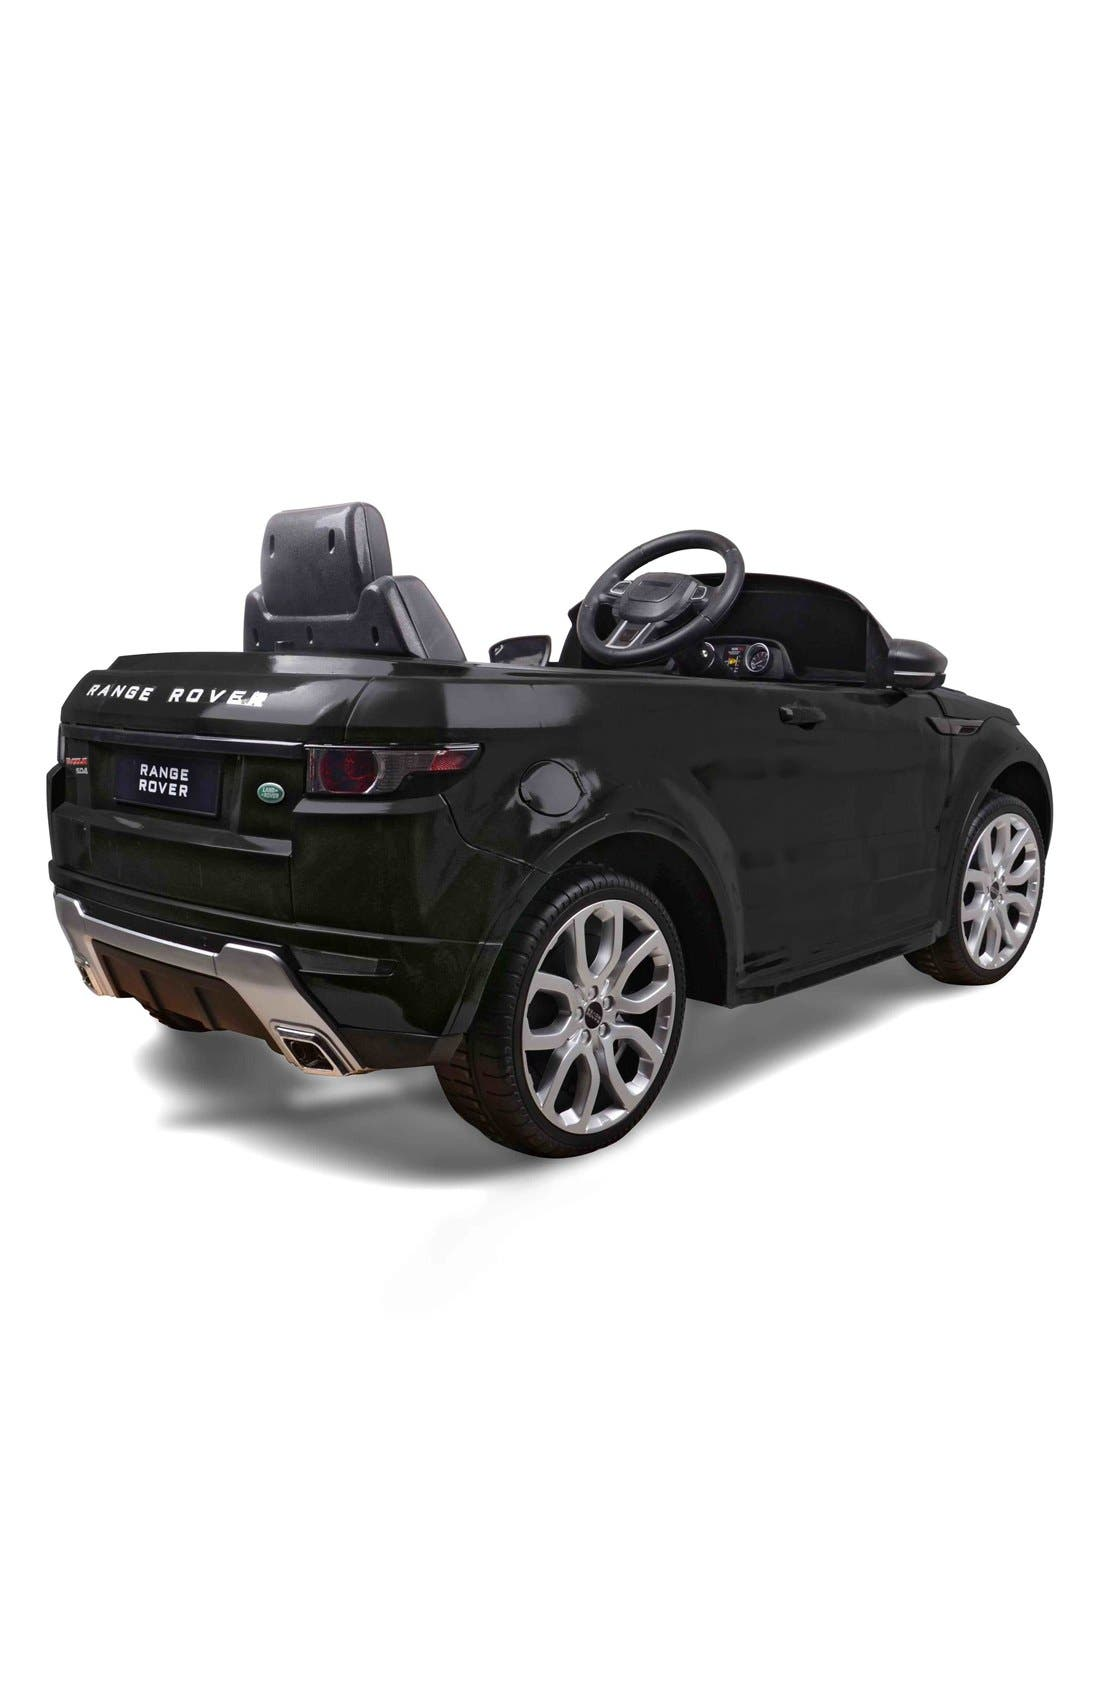 'Range Rover Evoque' 12V RC Ride-On Toy Car,                             Alternate thumbnail 5, color,                             001